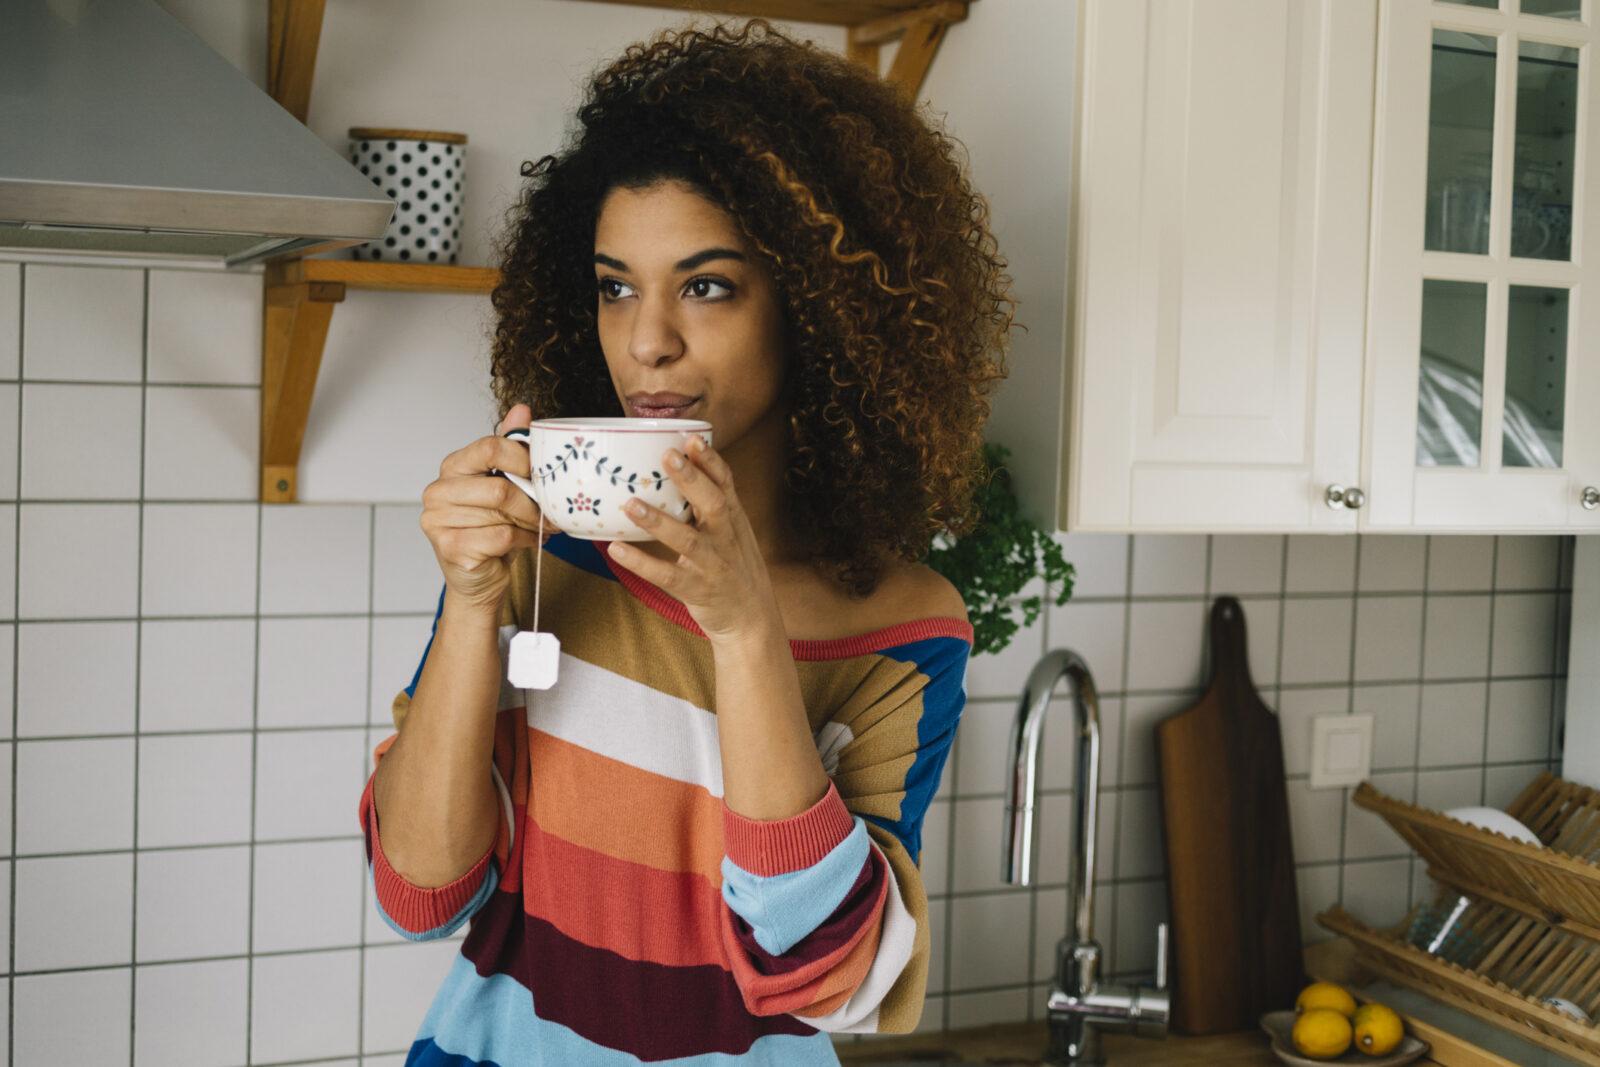 Beautiful young woman enjoying a cup of energizing caffeine free tea